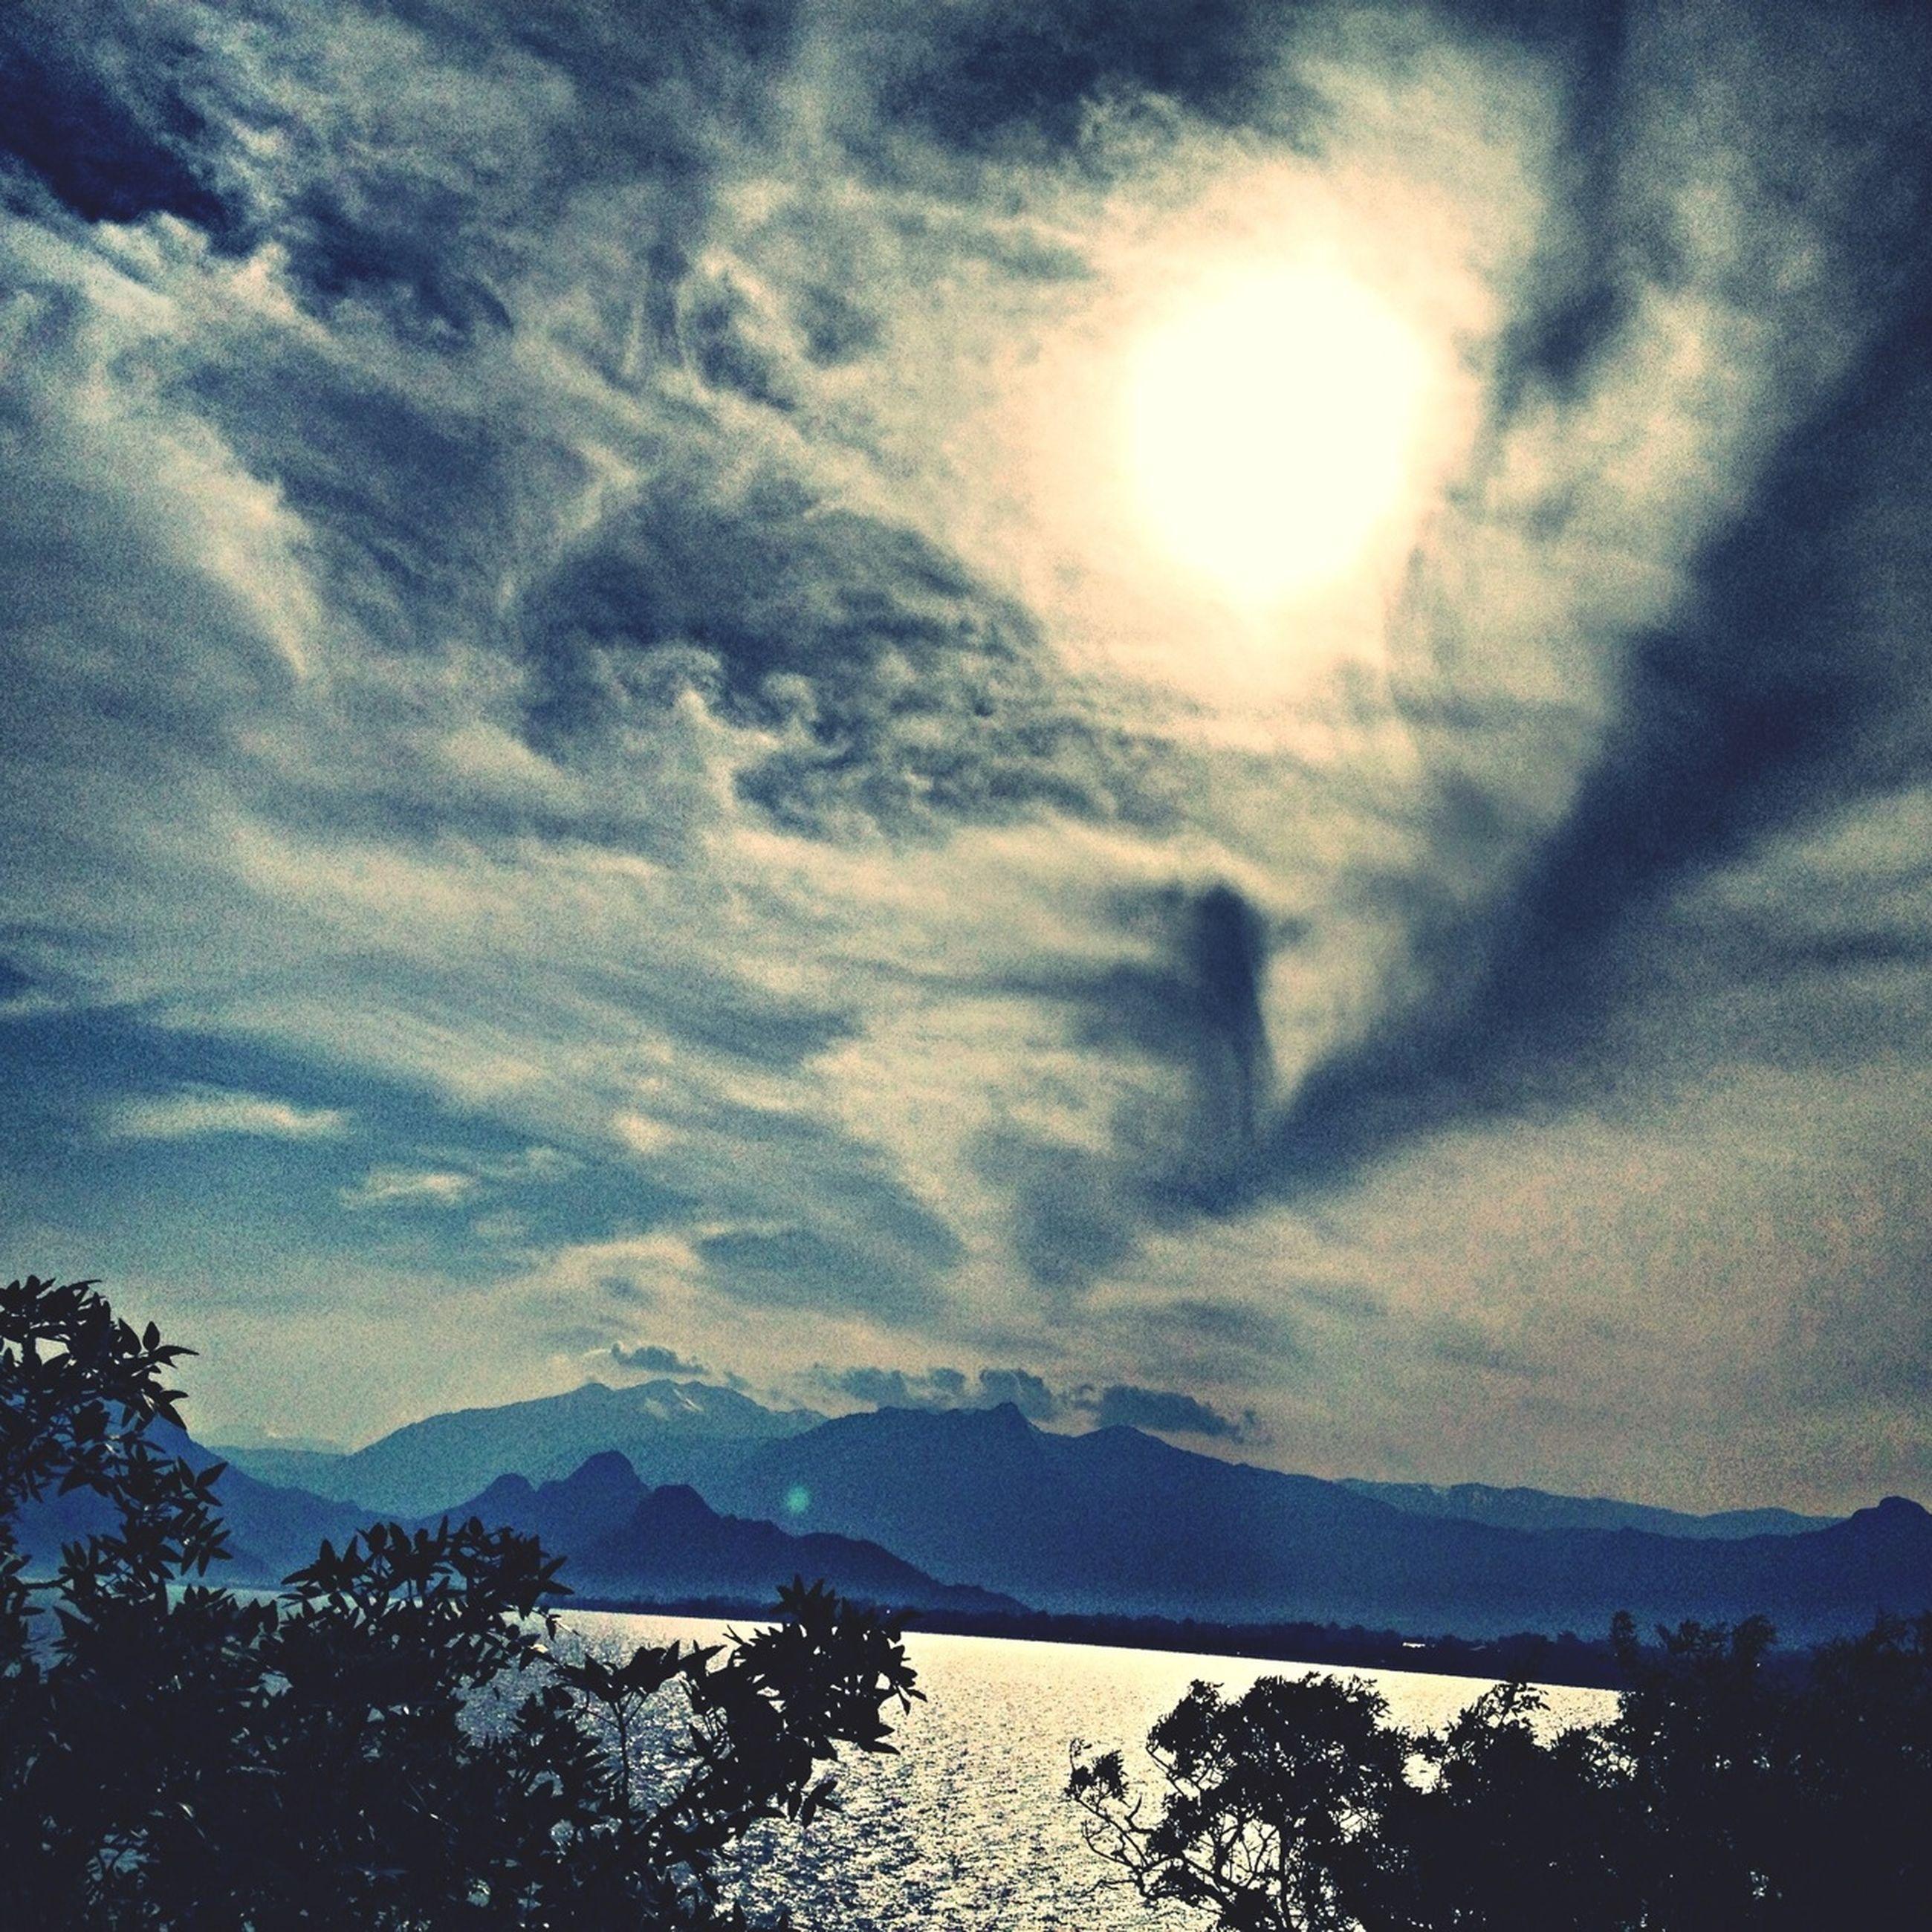 mountain, tranquil scene, scenics, tranquility, beauty in nature, sky, mountain range, cloud - sky, nature, sun, tree, idyllic, weather, silhouette, cloudy, landscape, sunlight, non-urban scene, sunbeam, cloud